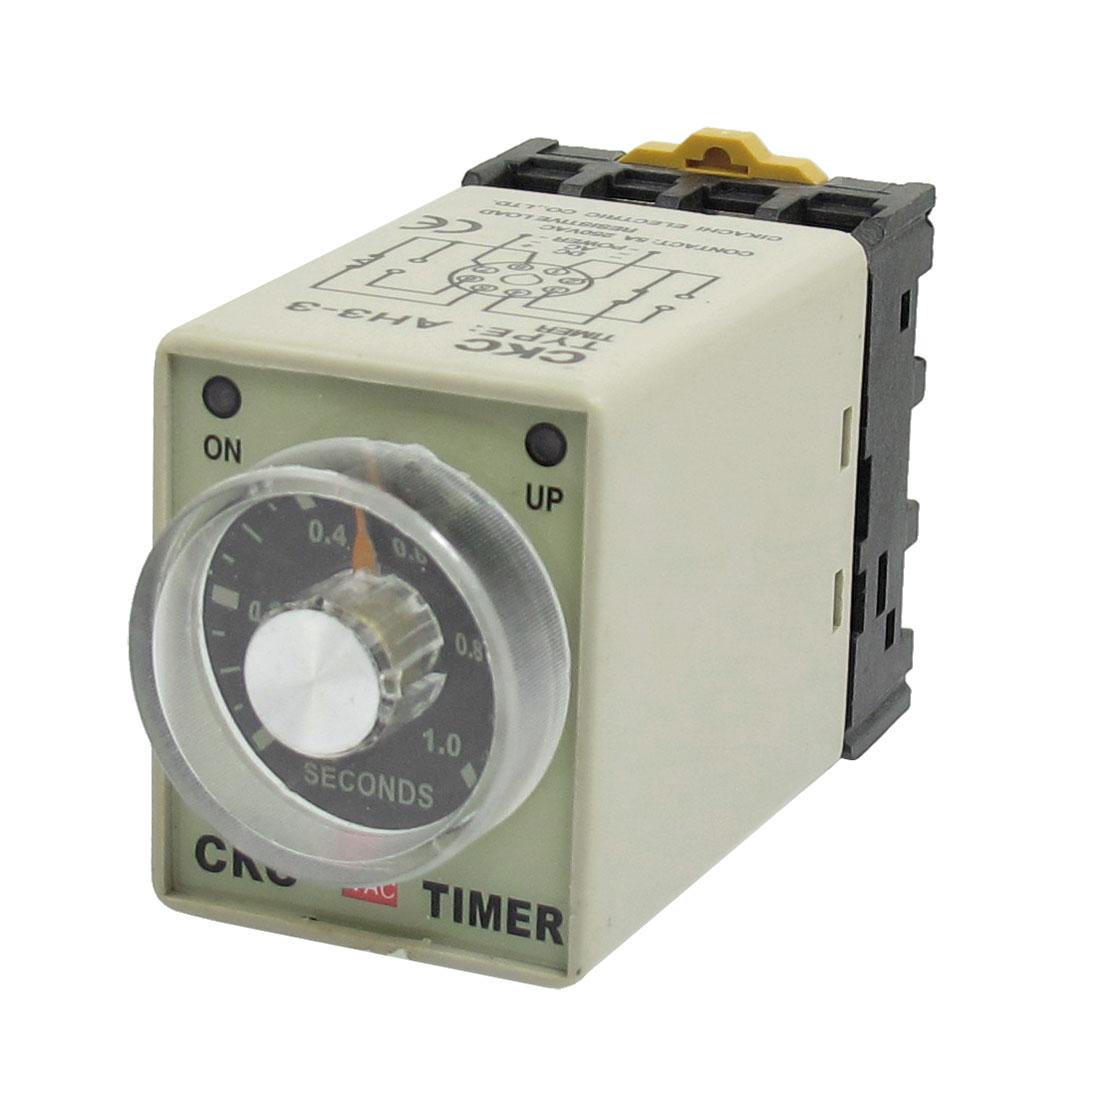 0-1 Sec 8 Pin Plastic Housing Delay Timer Time Relay AC 220V AH3-3 w Base